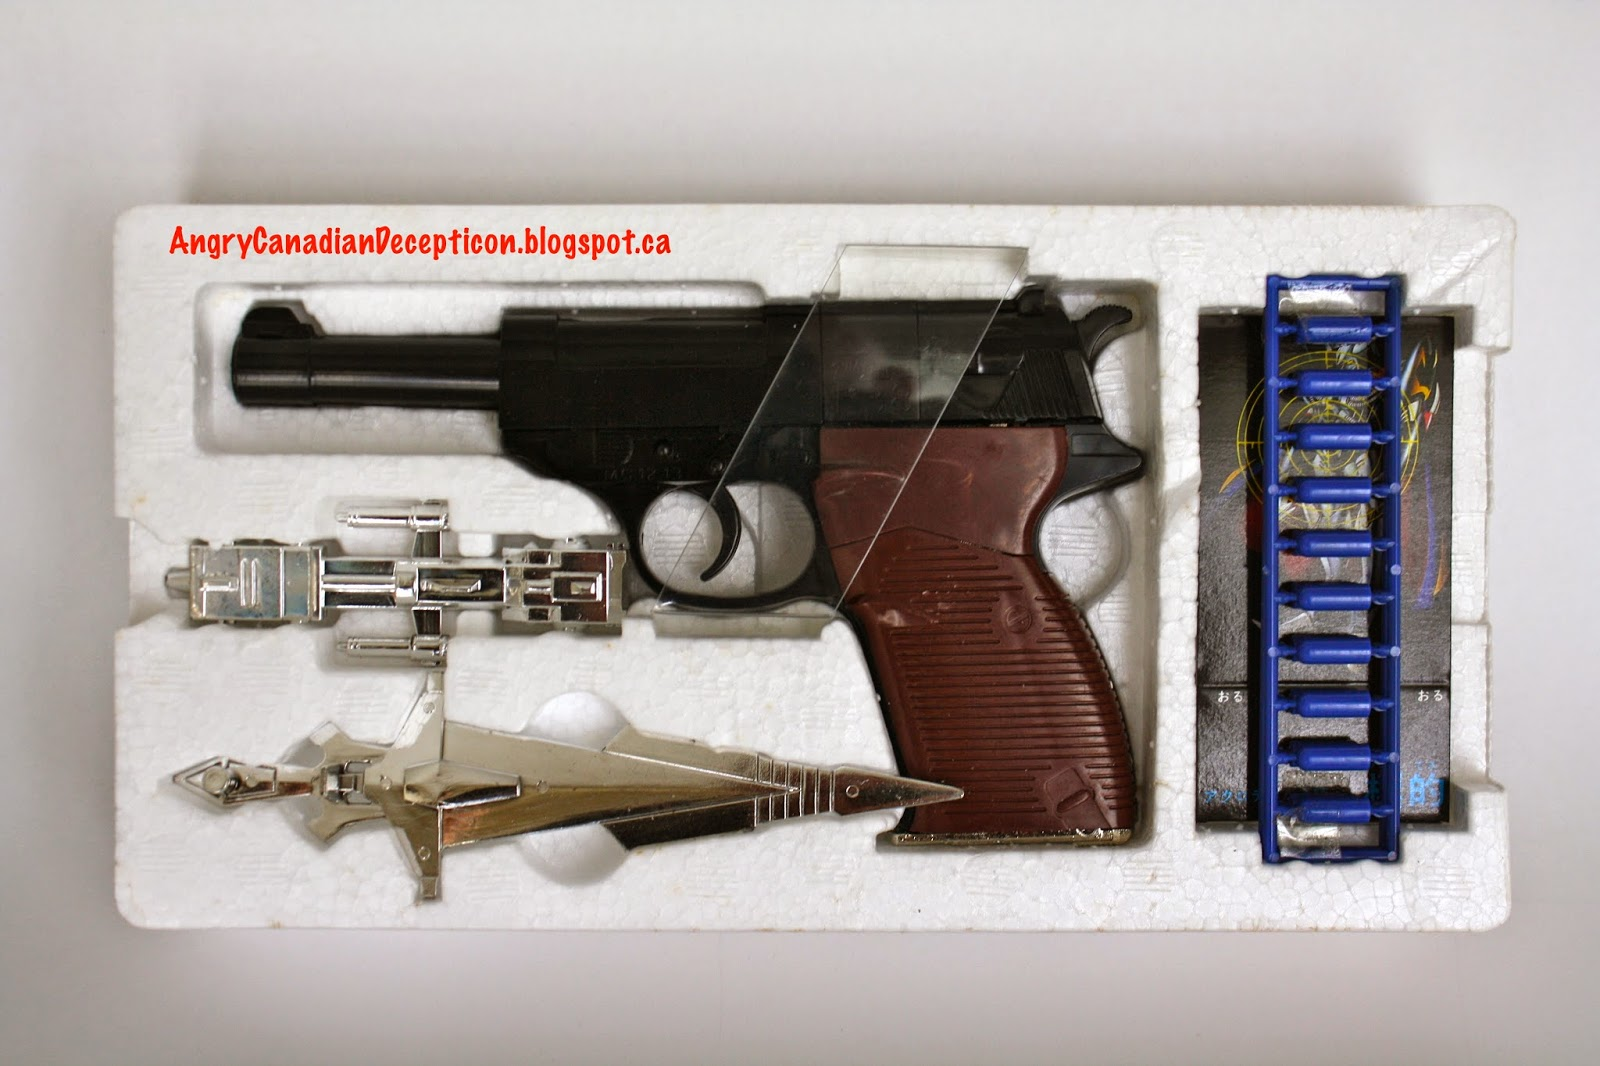 Microman Megatron'S Toy 104